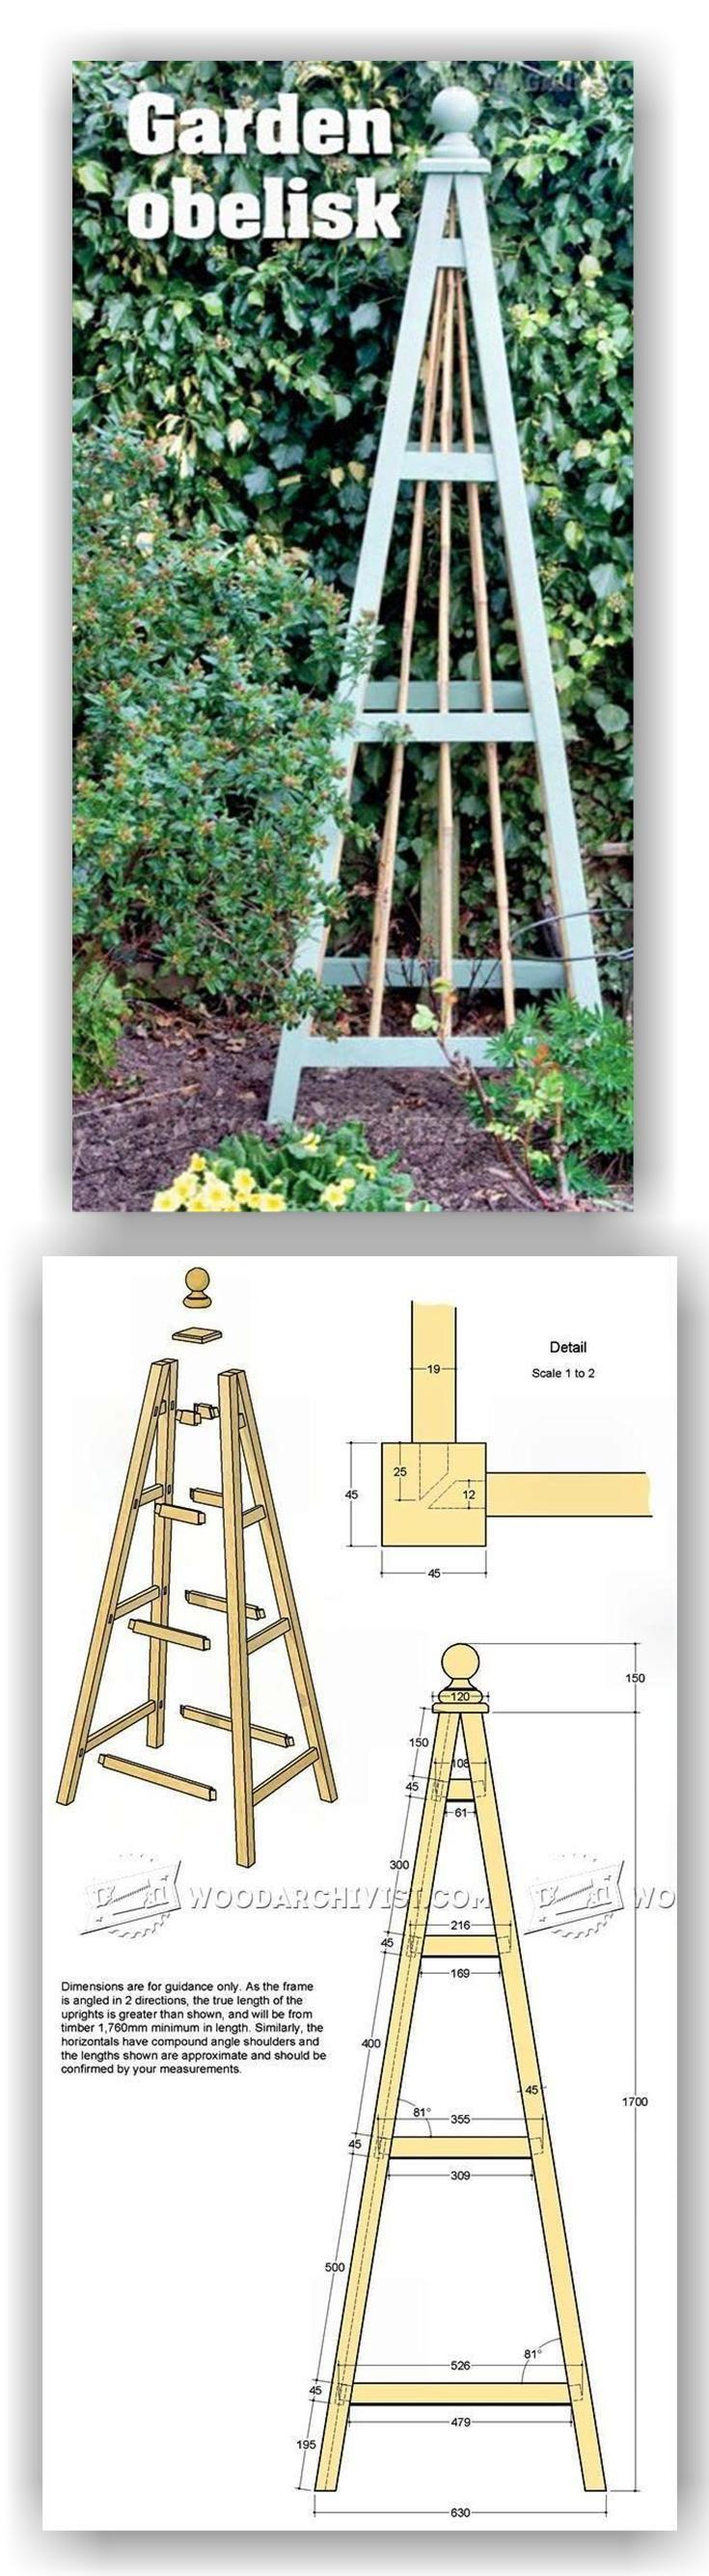 Garden Obelisk Plans - Outdoor Plans and Projects   WoodArchivist.com